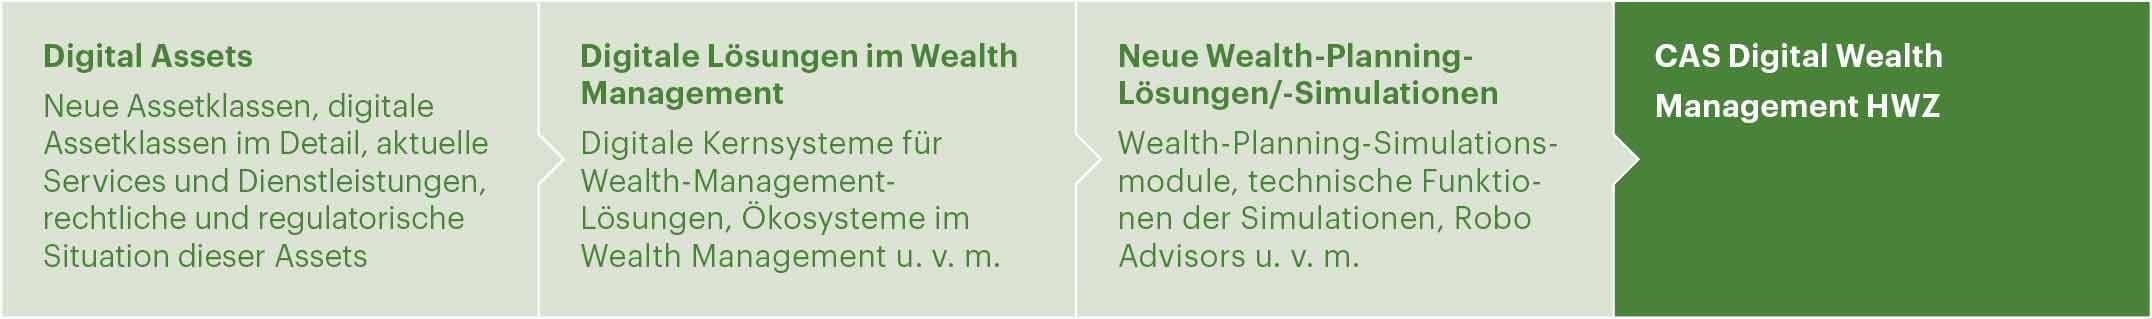 Modulaufbau CAS Digital Wealth Management HWZ